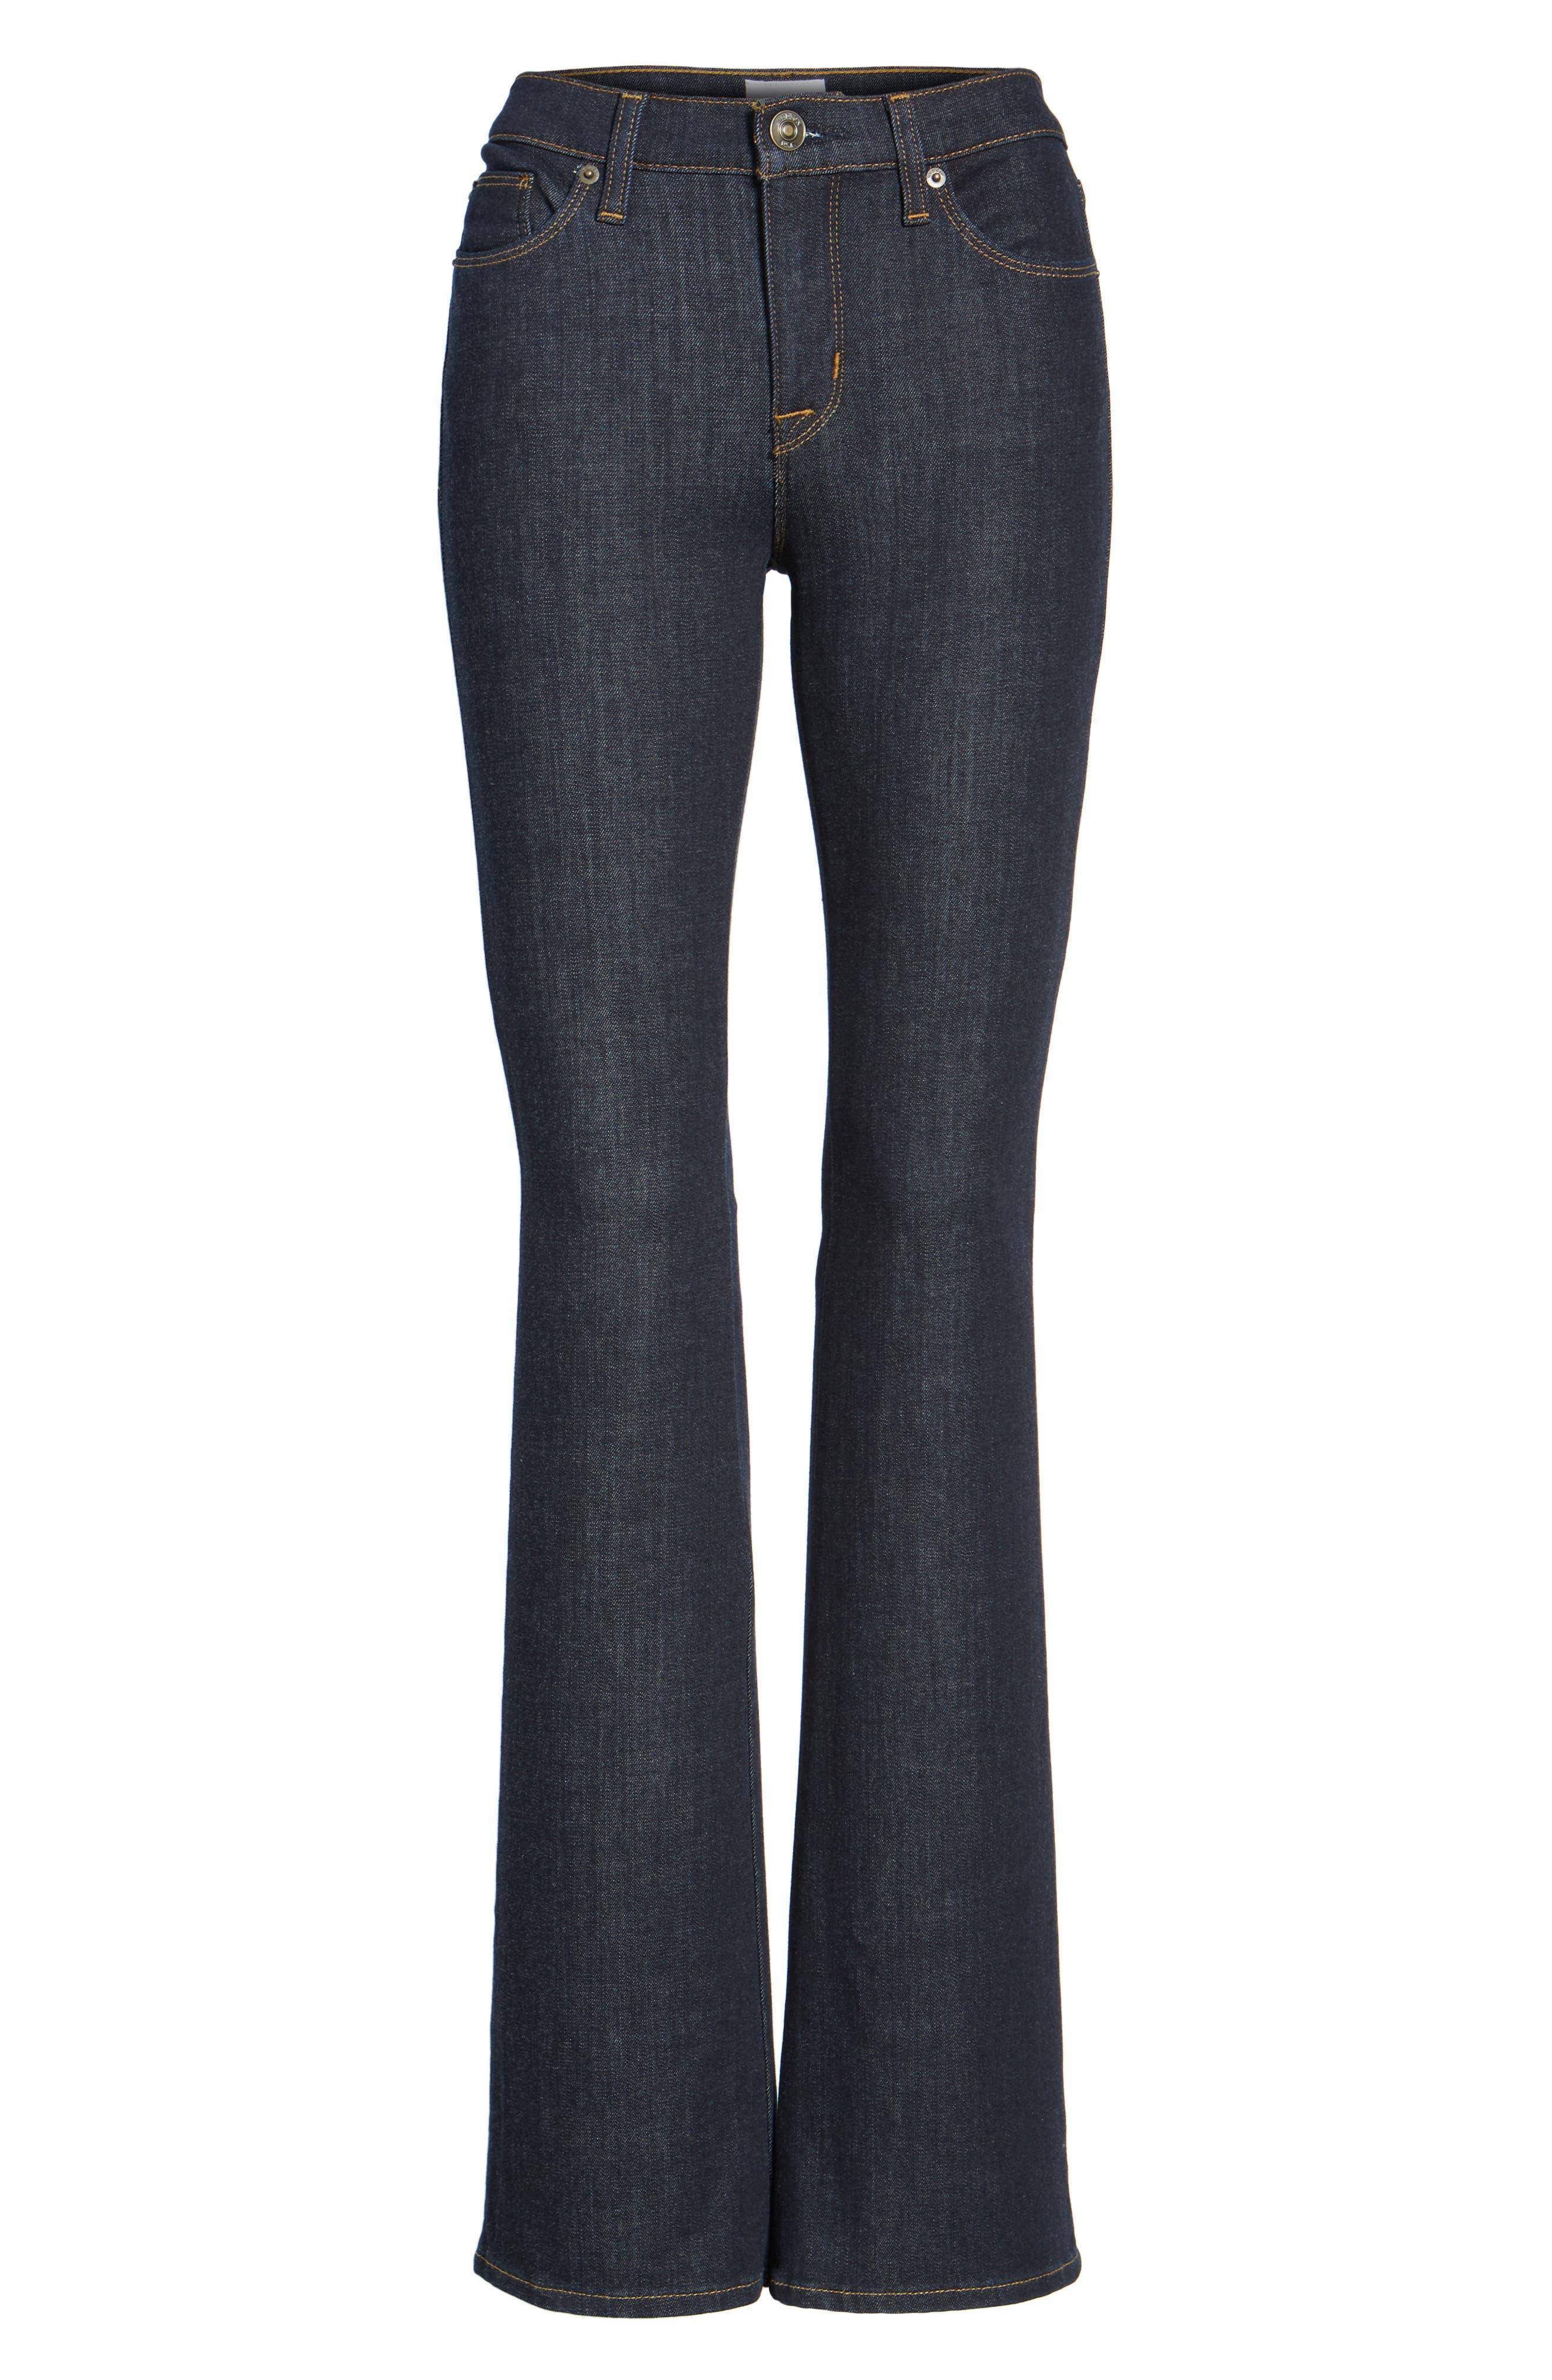 Hudson Drew Bootcut Jeans,                             Alternate thumbnail 6, color,                             402